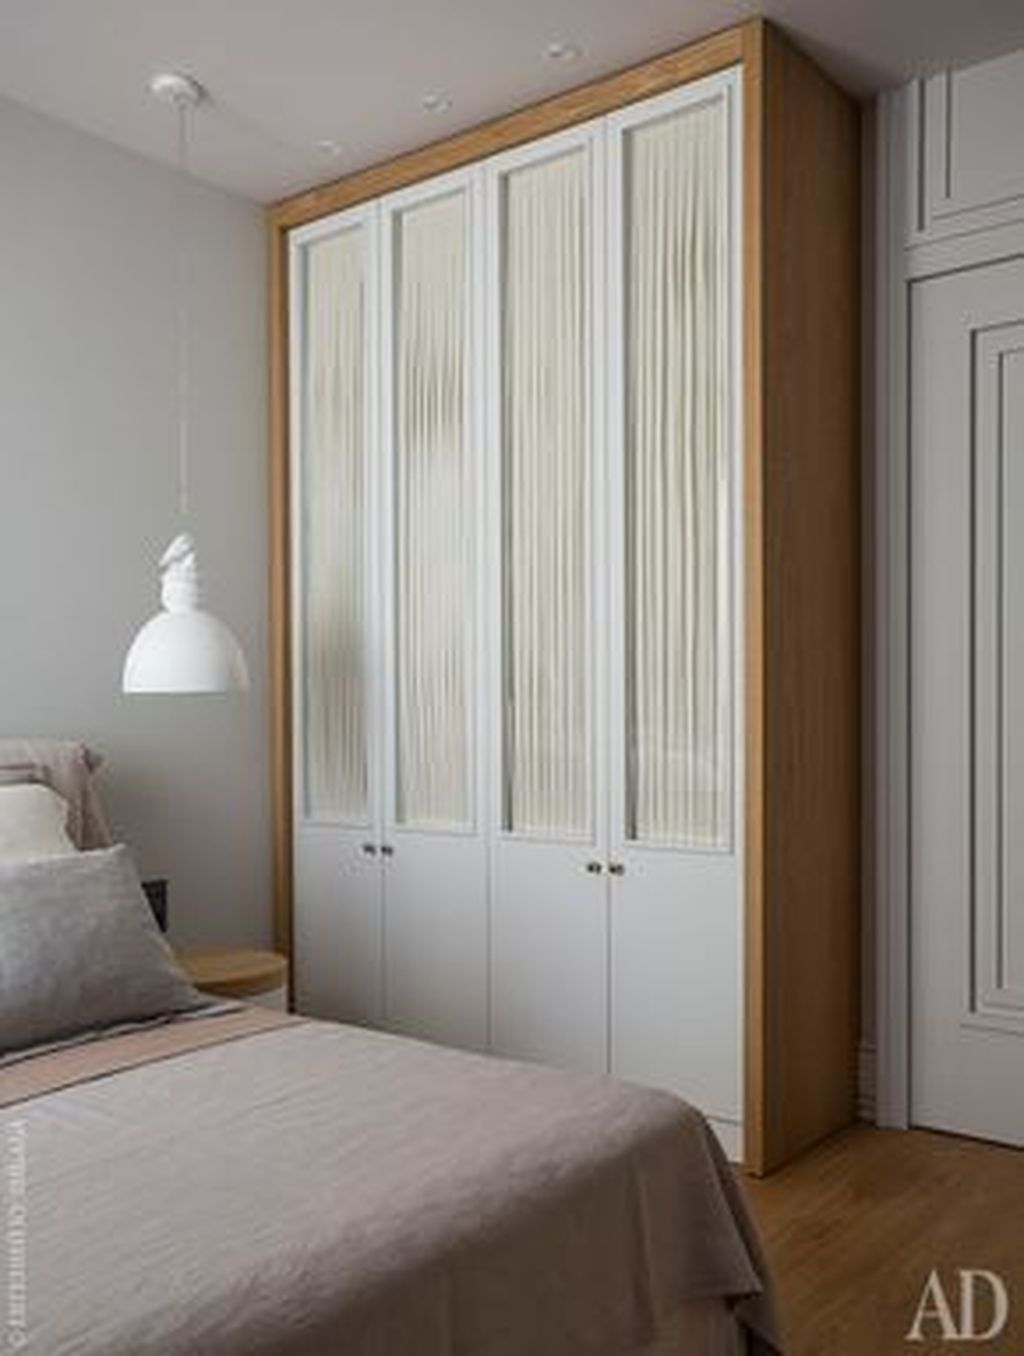 30 Delightful Wardrobe Shutter Designs Ideas For Children Linen Closet Design Closet Furniture Closet Design